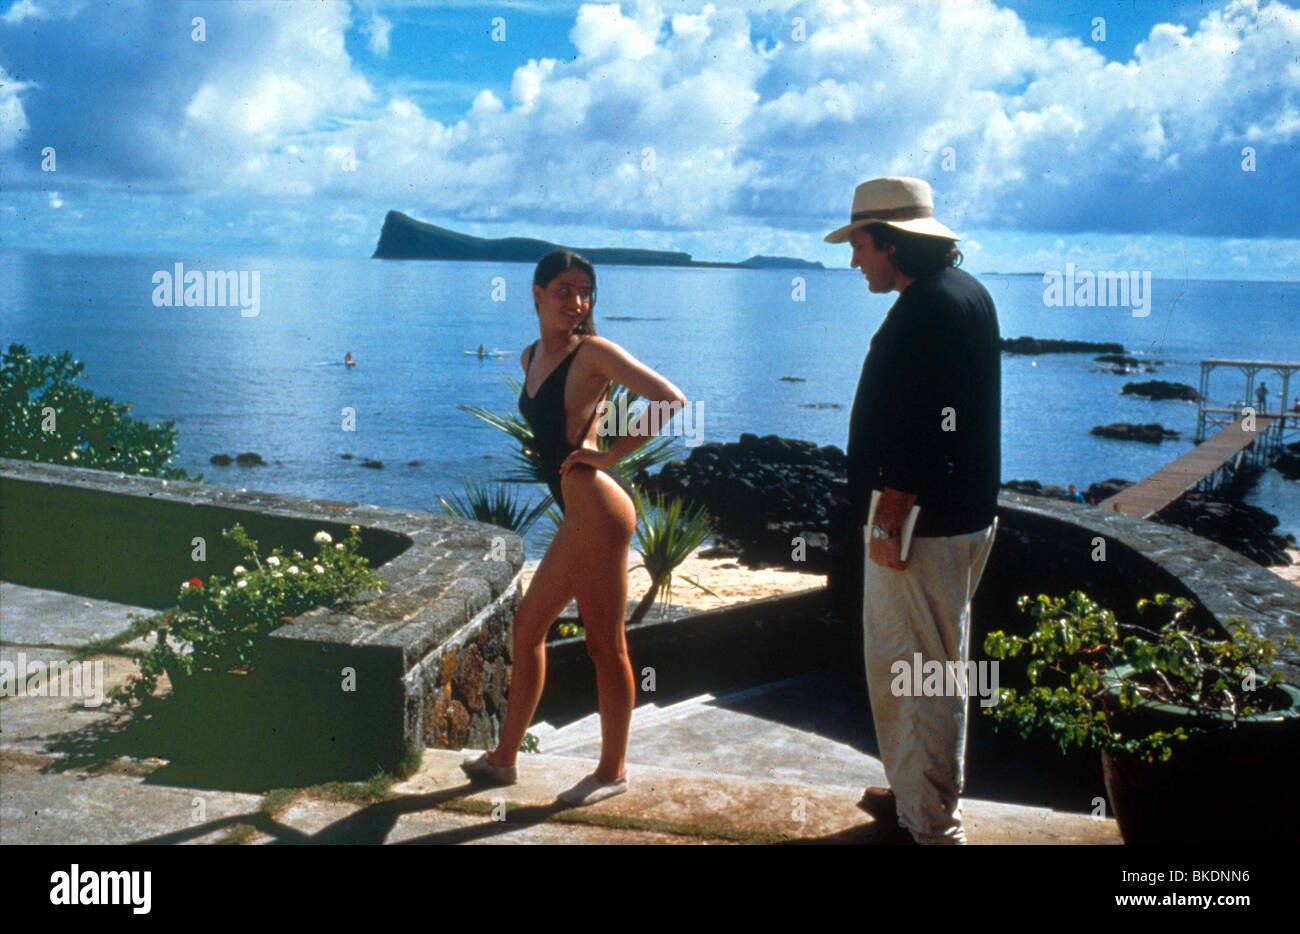 MON PERE CE HEROS (1994) MY FATHER THE HERO (ALT) MARIE GILLAIN, GERARD DEPARDIEU MPCH 001 - Stock Image